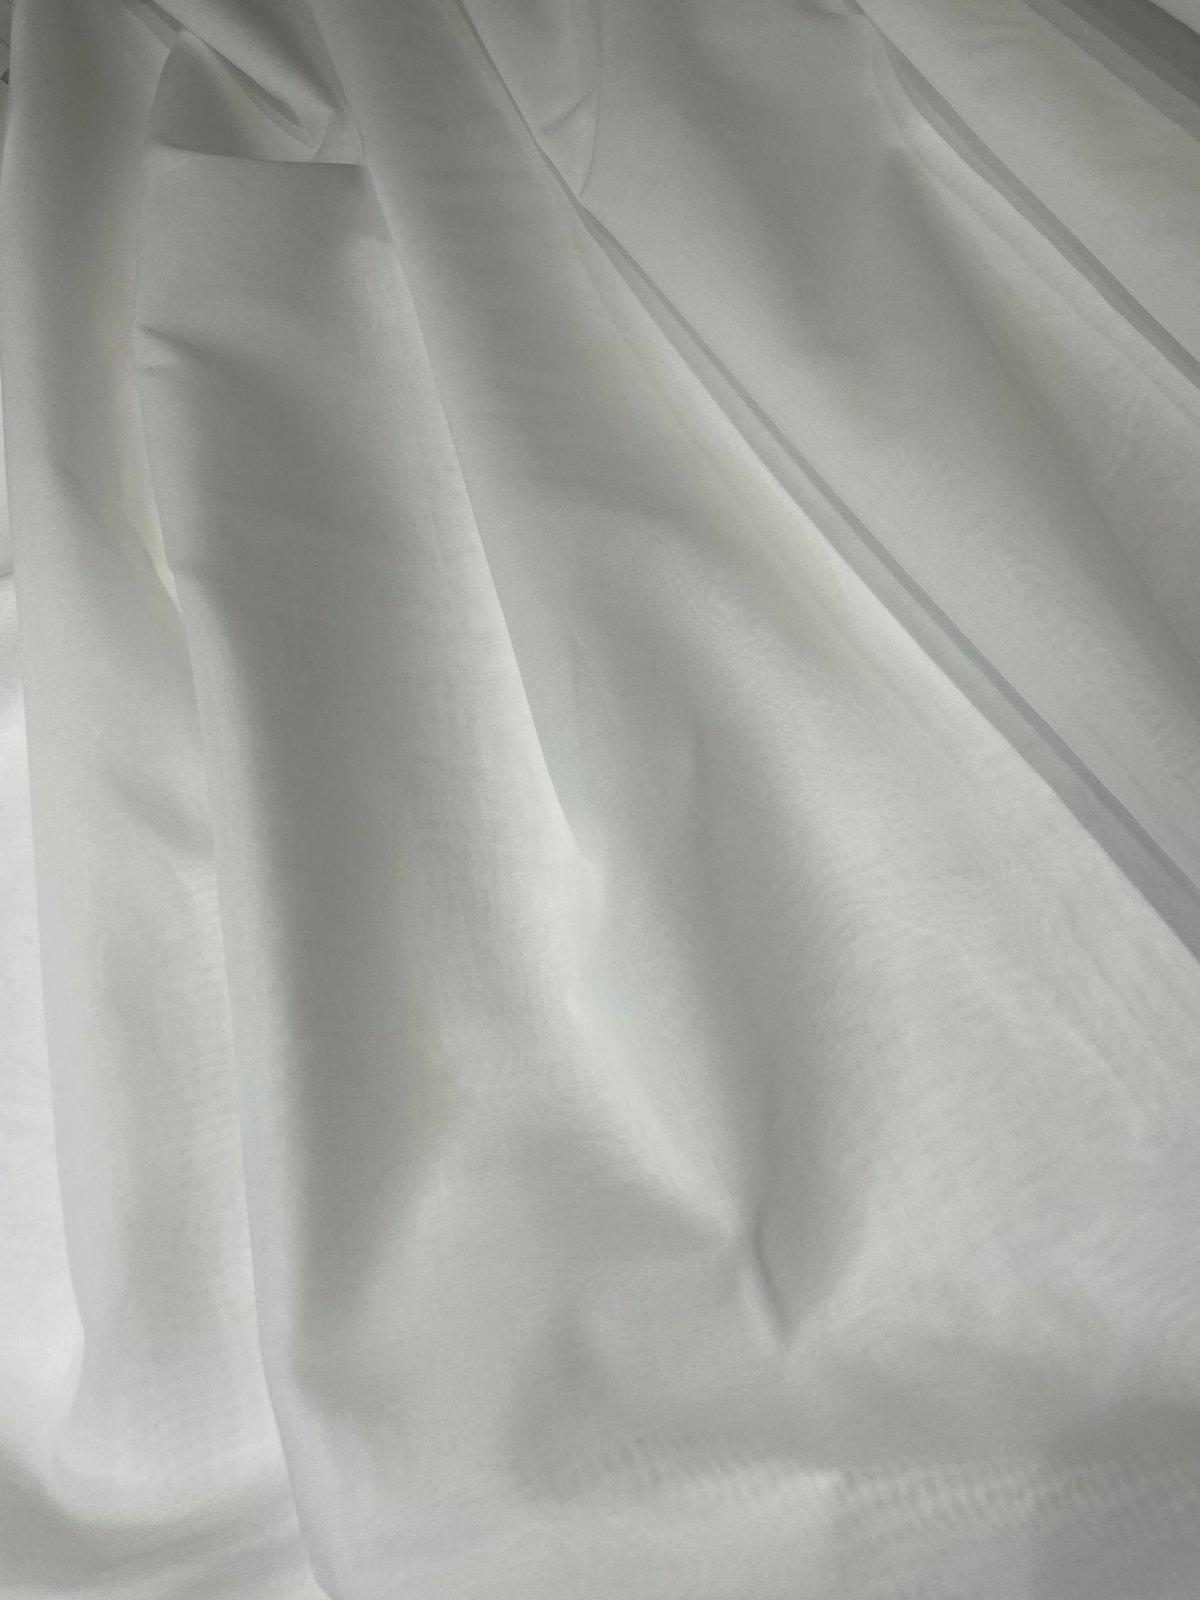 Swiss Cotton Voile